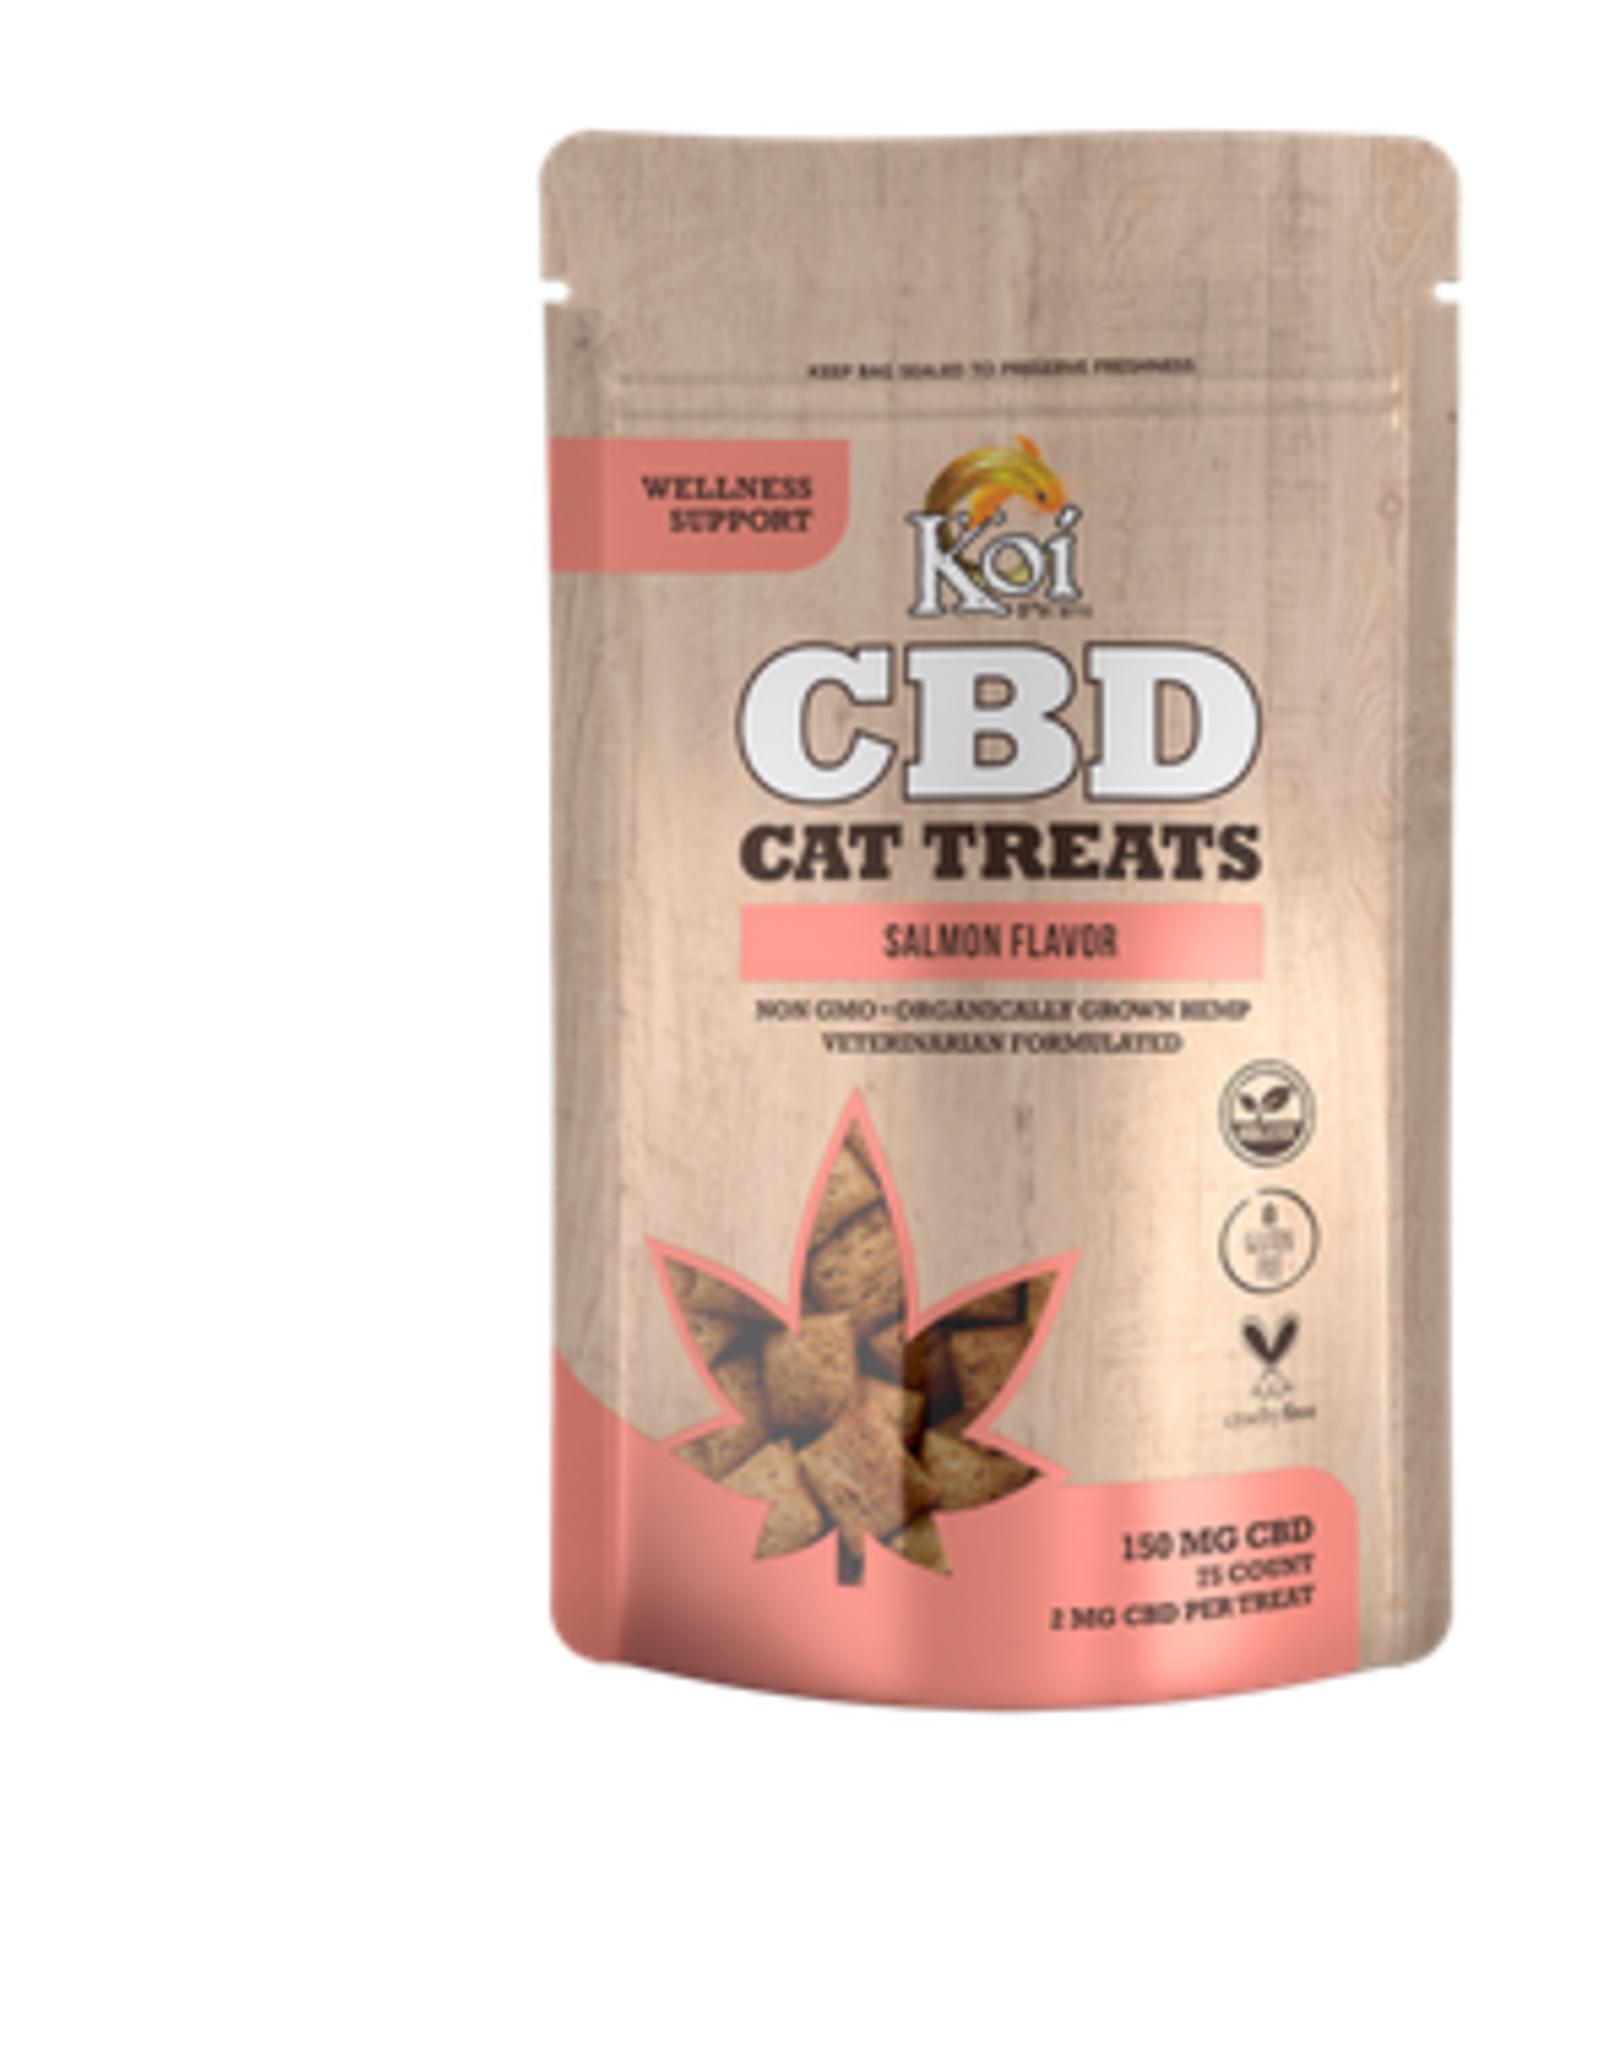 Koi CBD Cat Treats 150mg 75ct/Bag, Salmon Flavor